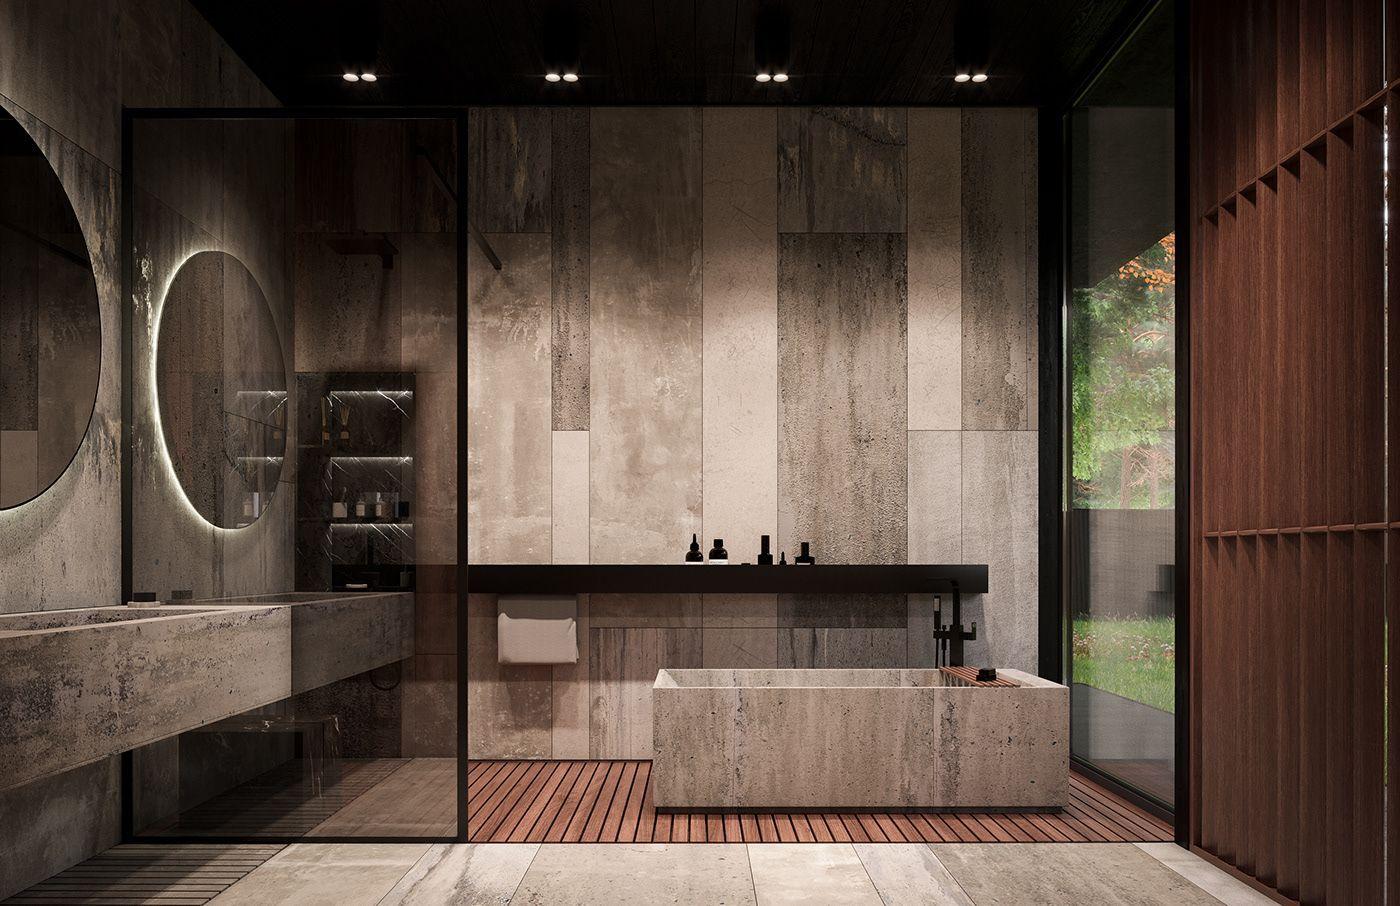 Roma House Interior Buro511 On Behance Luxurybathroomblog Bathroom Design Inspiration Rustic Home Interiors Bathroom Interior Design